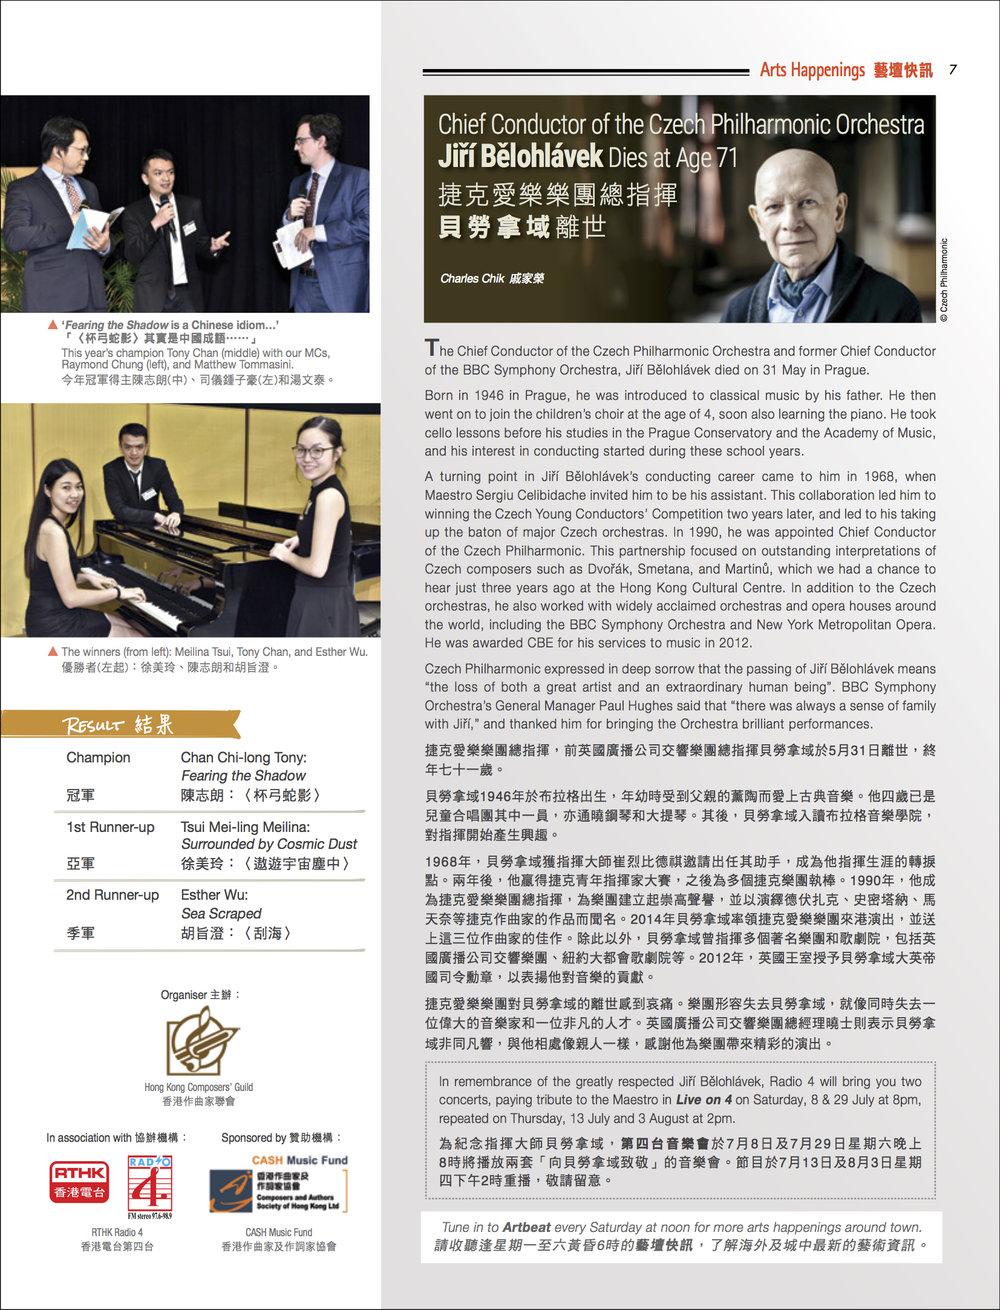 FM.HKCG.2.jpg